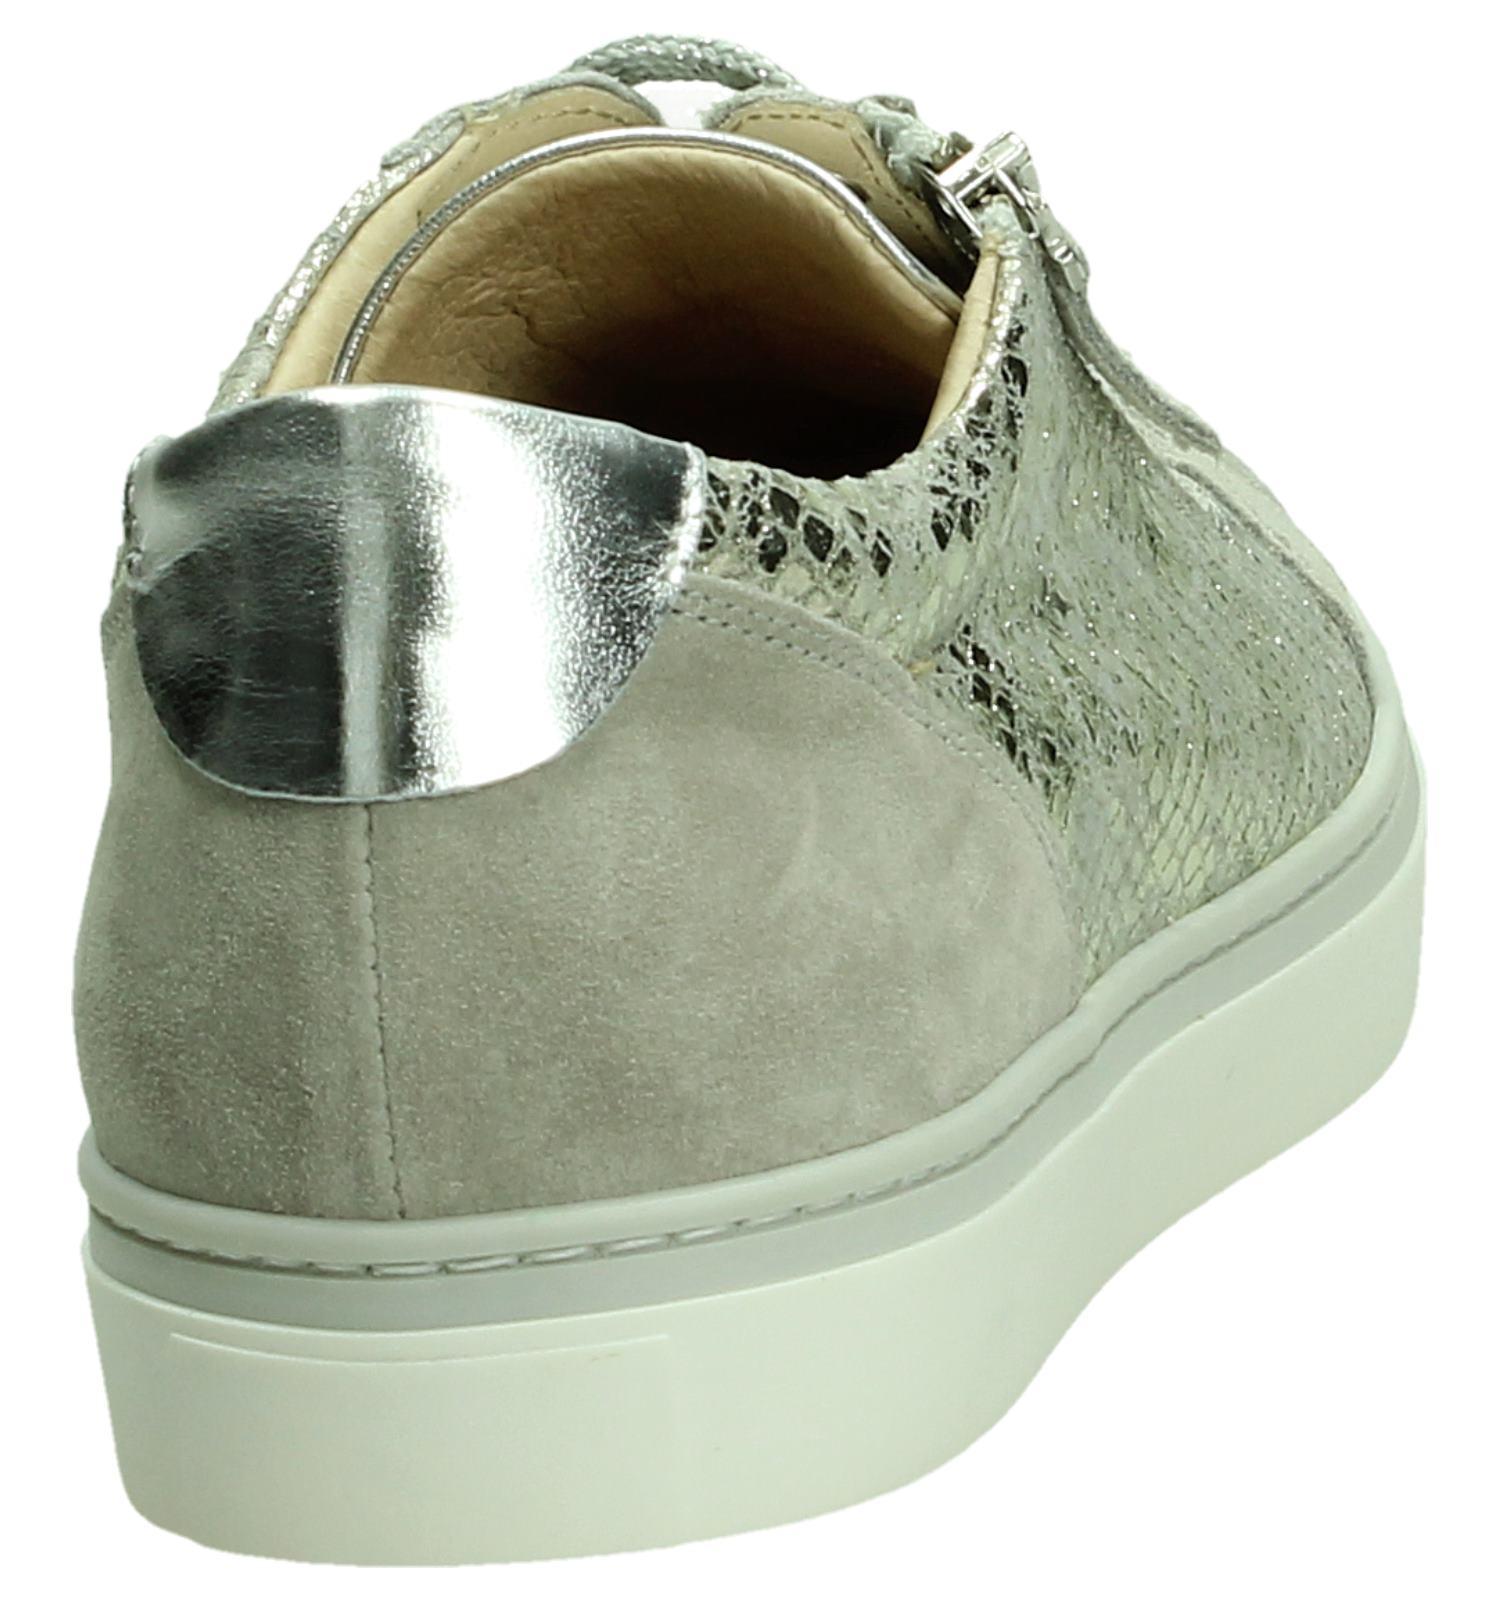 Zilvern Sneakers Tine's Zilvern Sneakers Tine's Zilvern Tine's Sneakers 8n0mNw